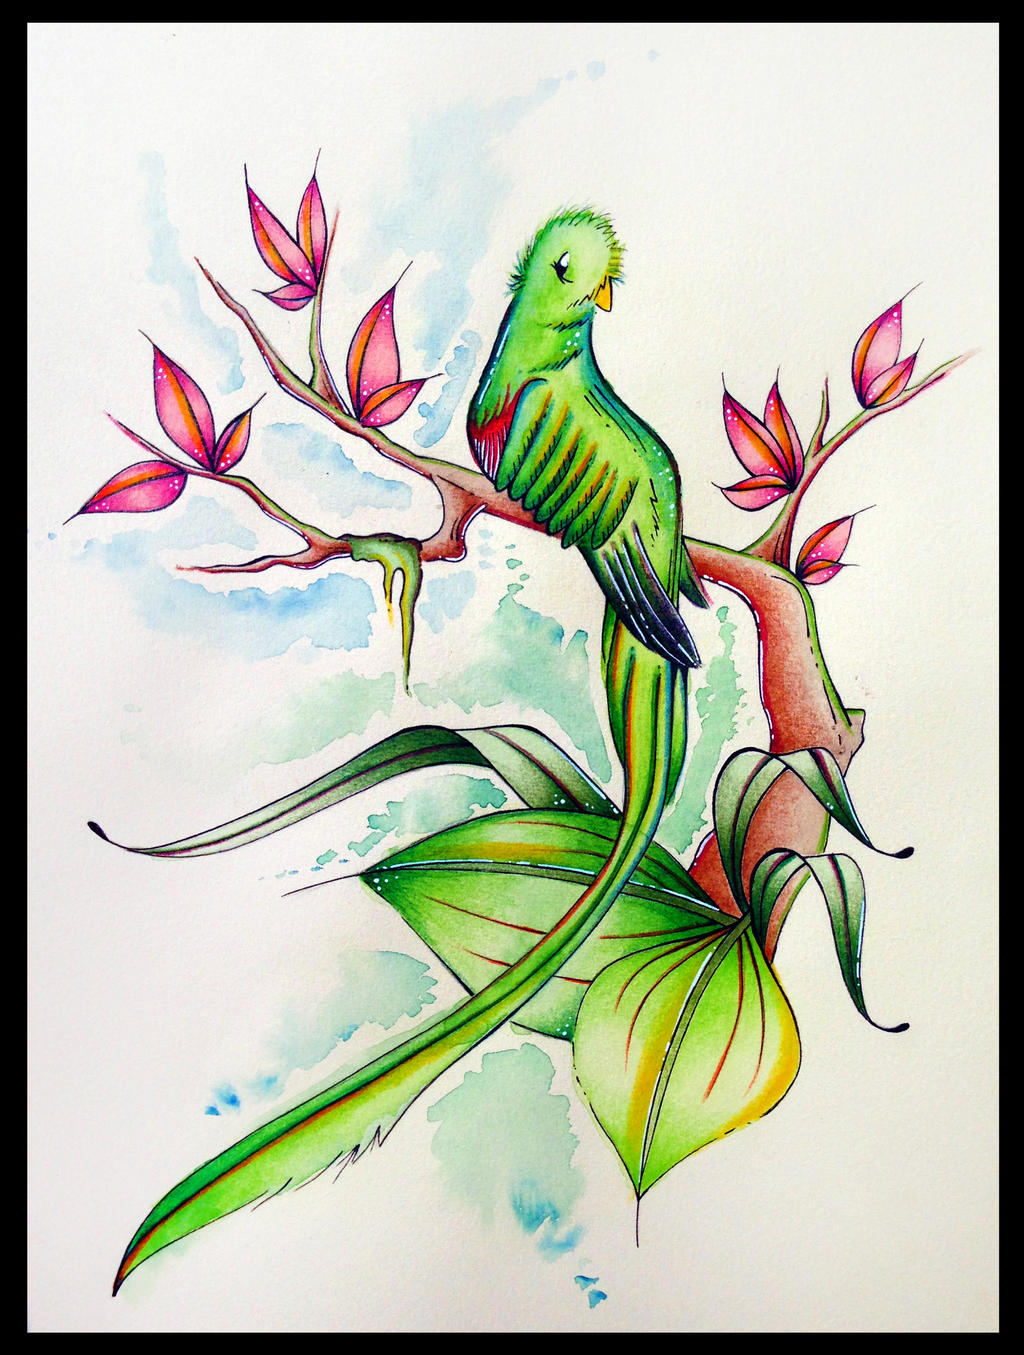 Resplendent Quetzal by PinkBunnie